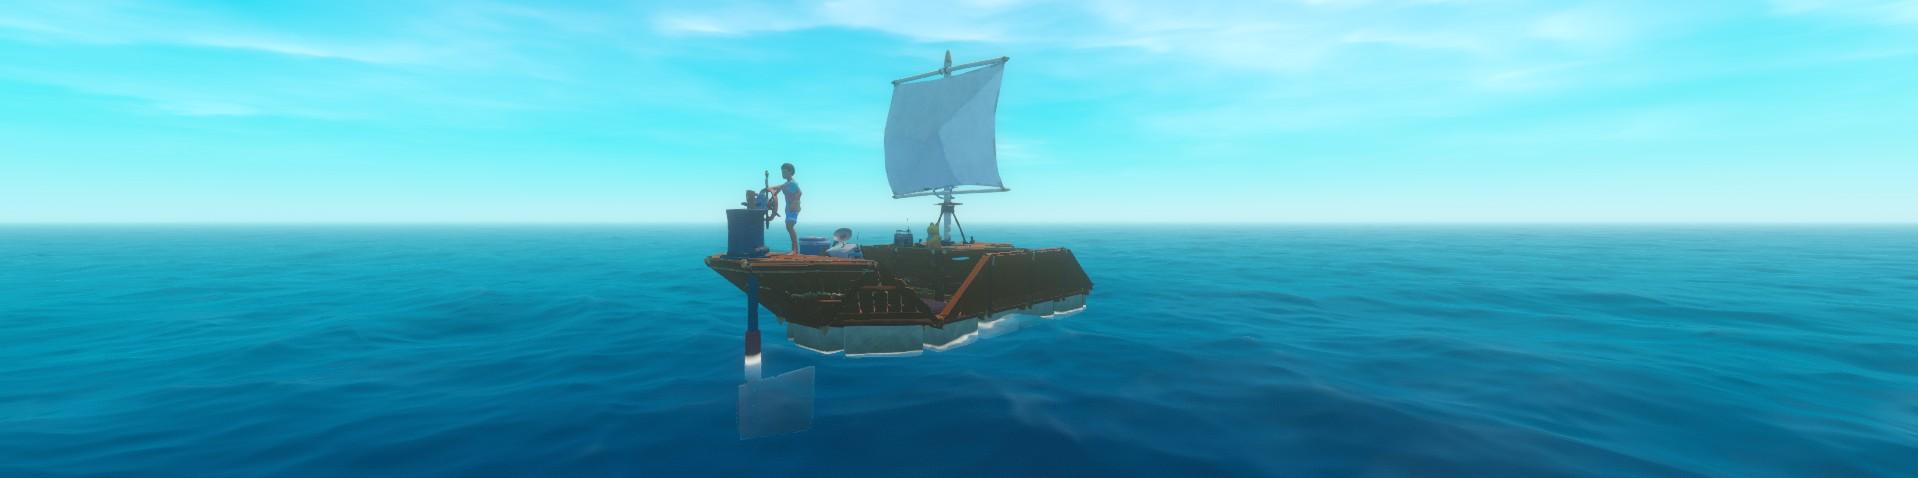 корабельник